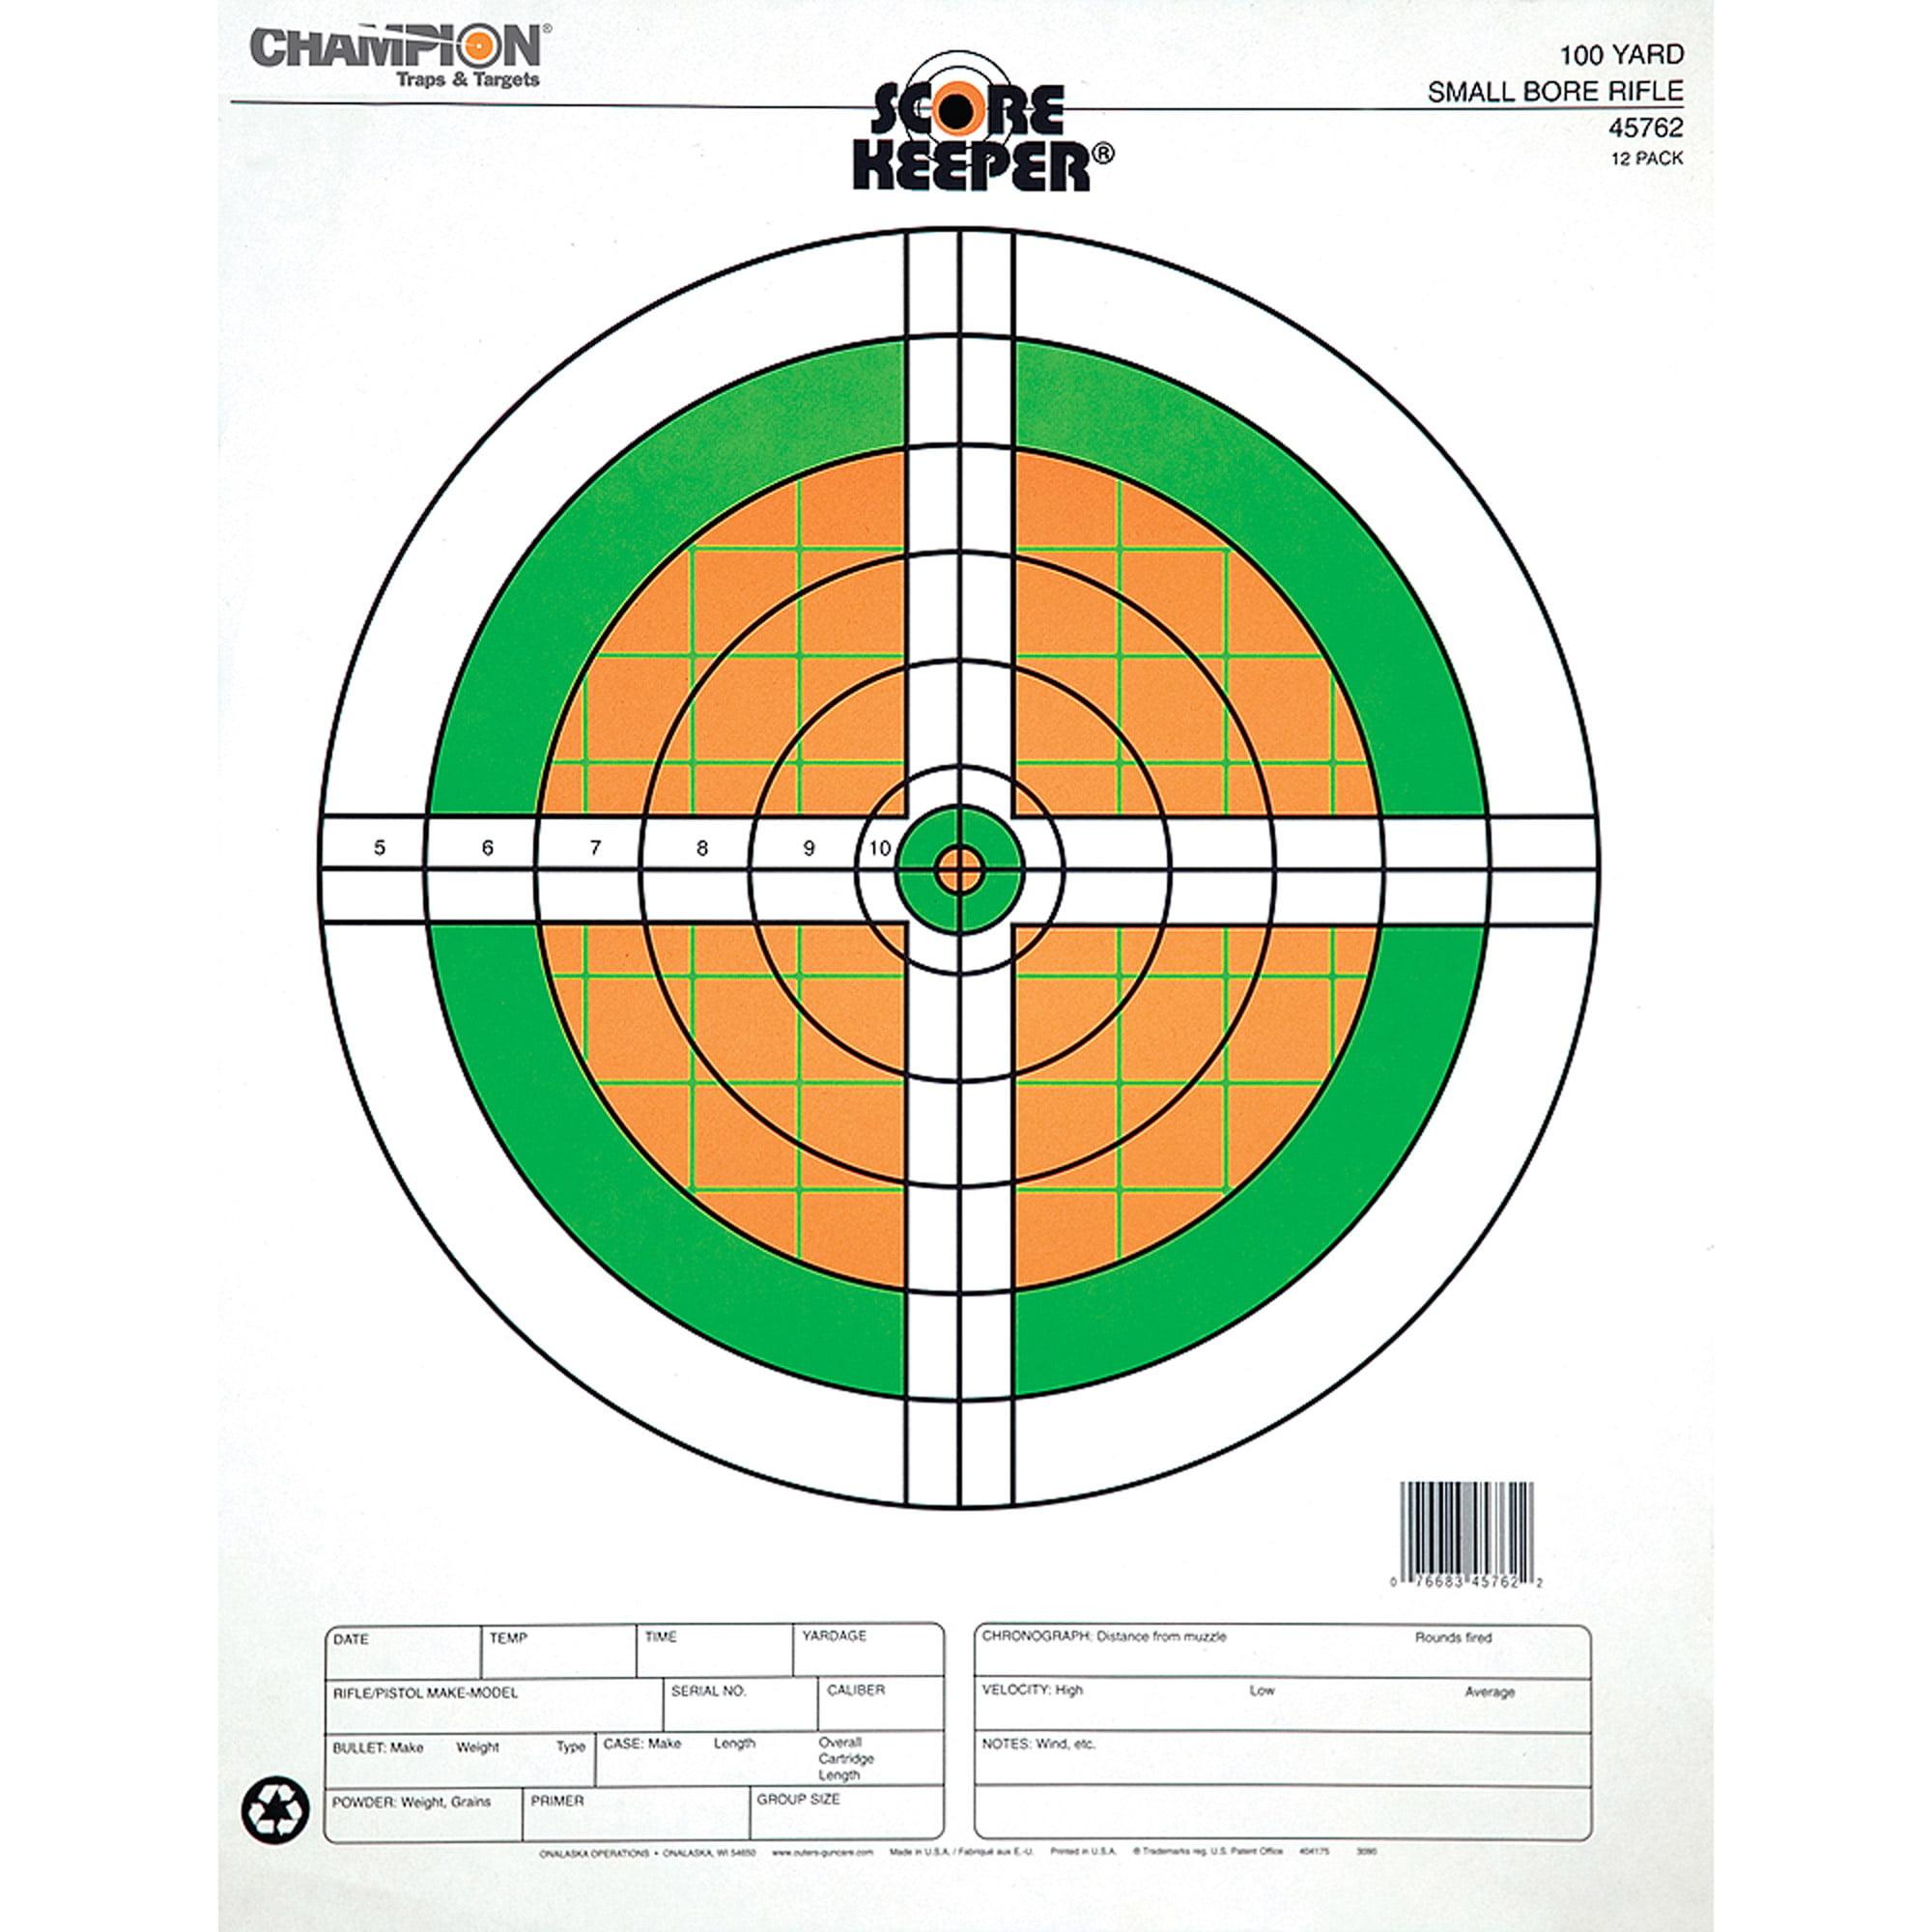 Champion Traps and Targets Fluorescent Orange/Green Bullseye Scorekeeper Target, 100 Yard Small Bore Rifle, 12pk